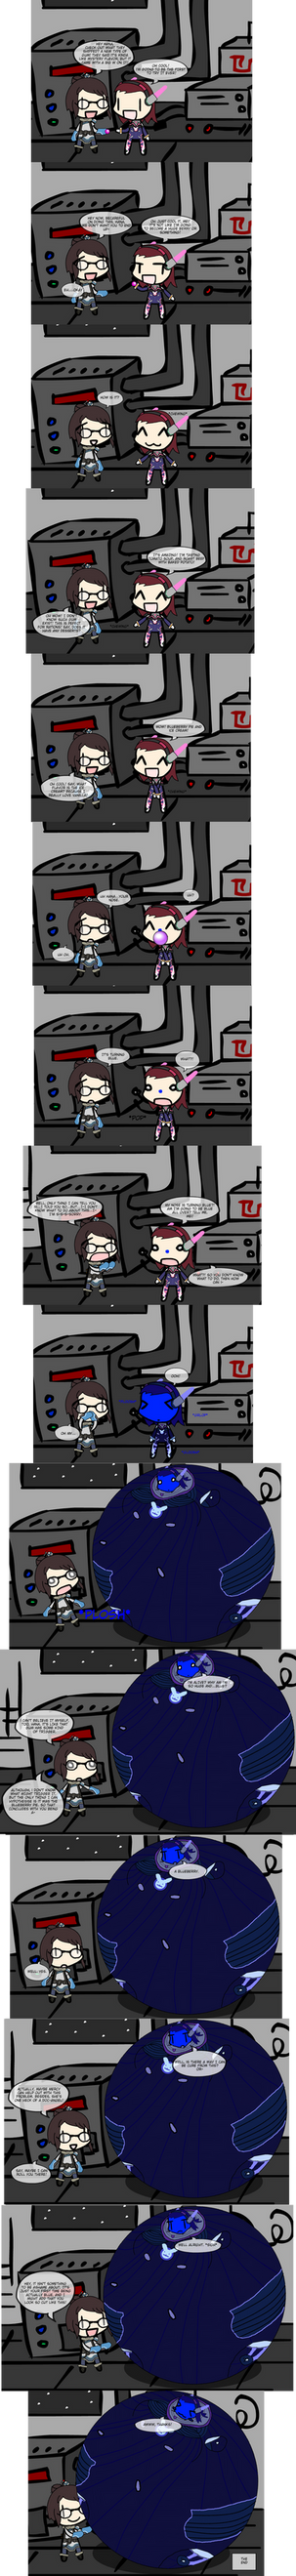 Overwatch: B.va by BittyHeart